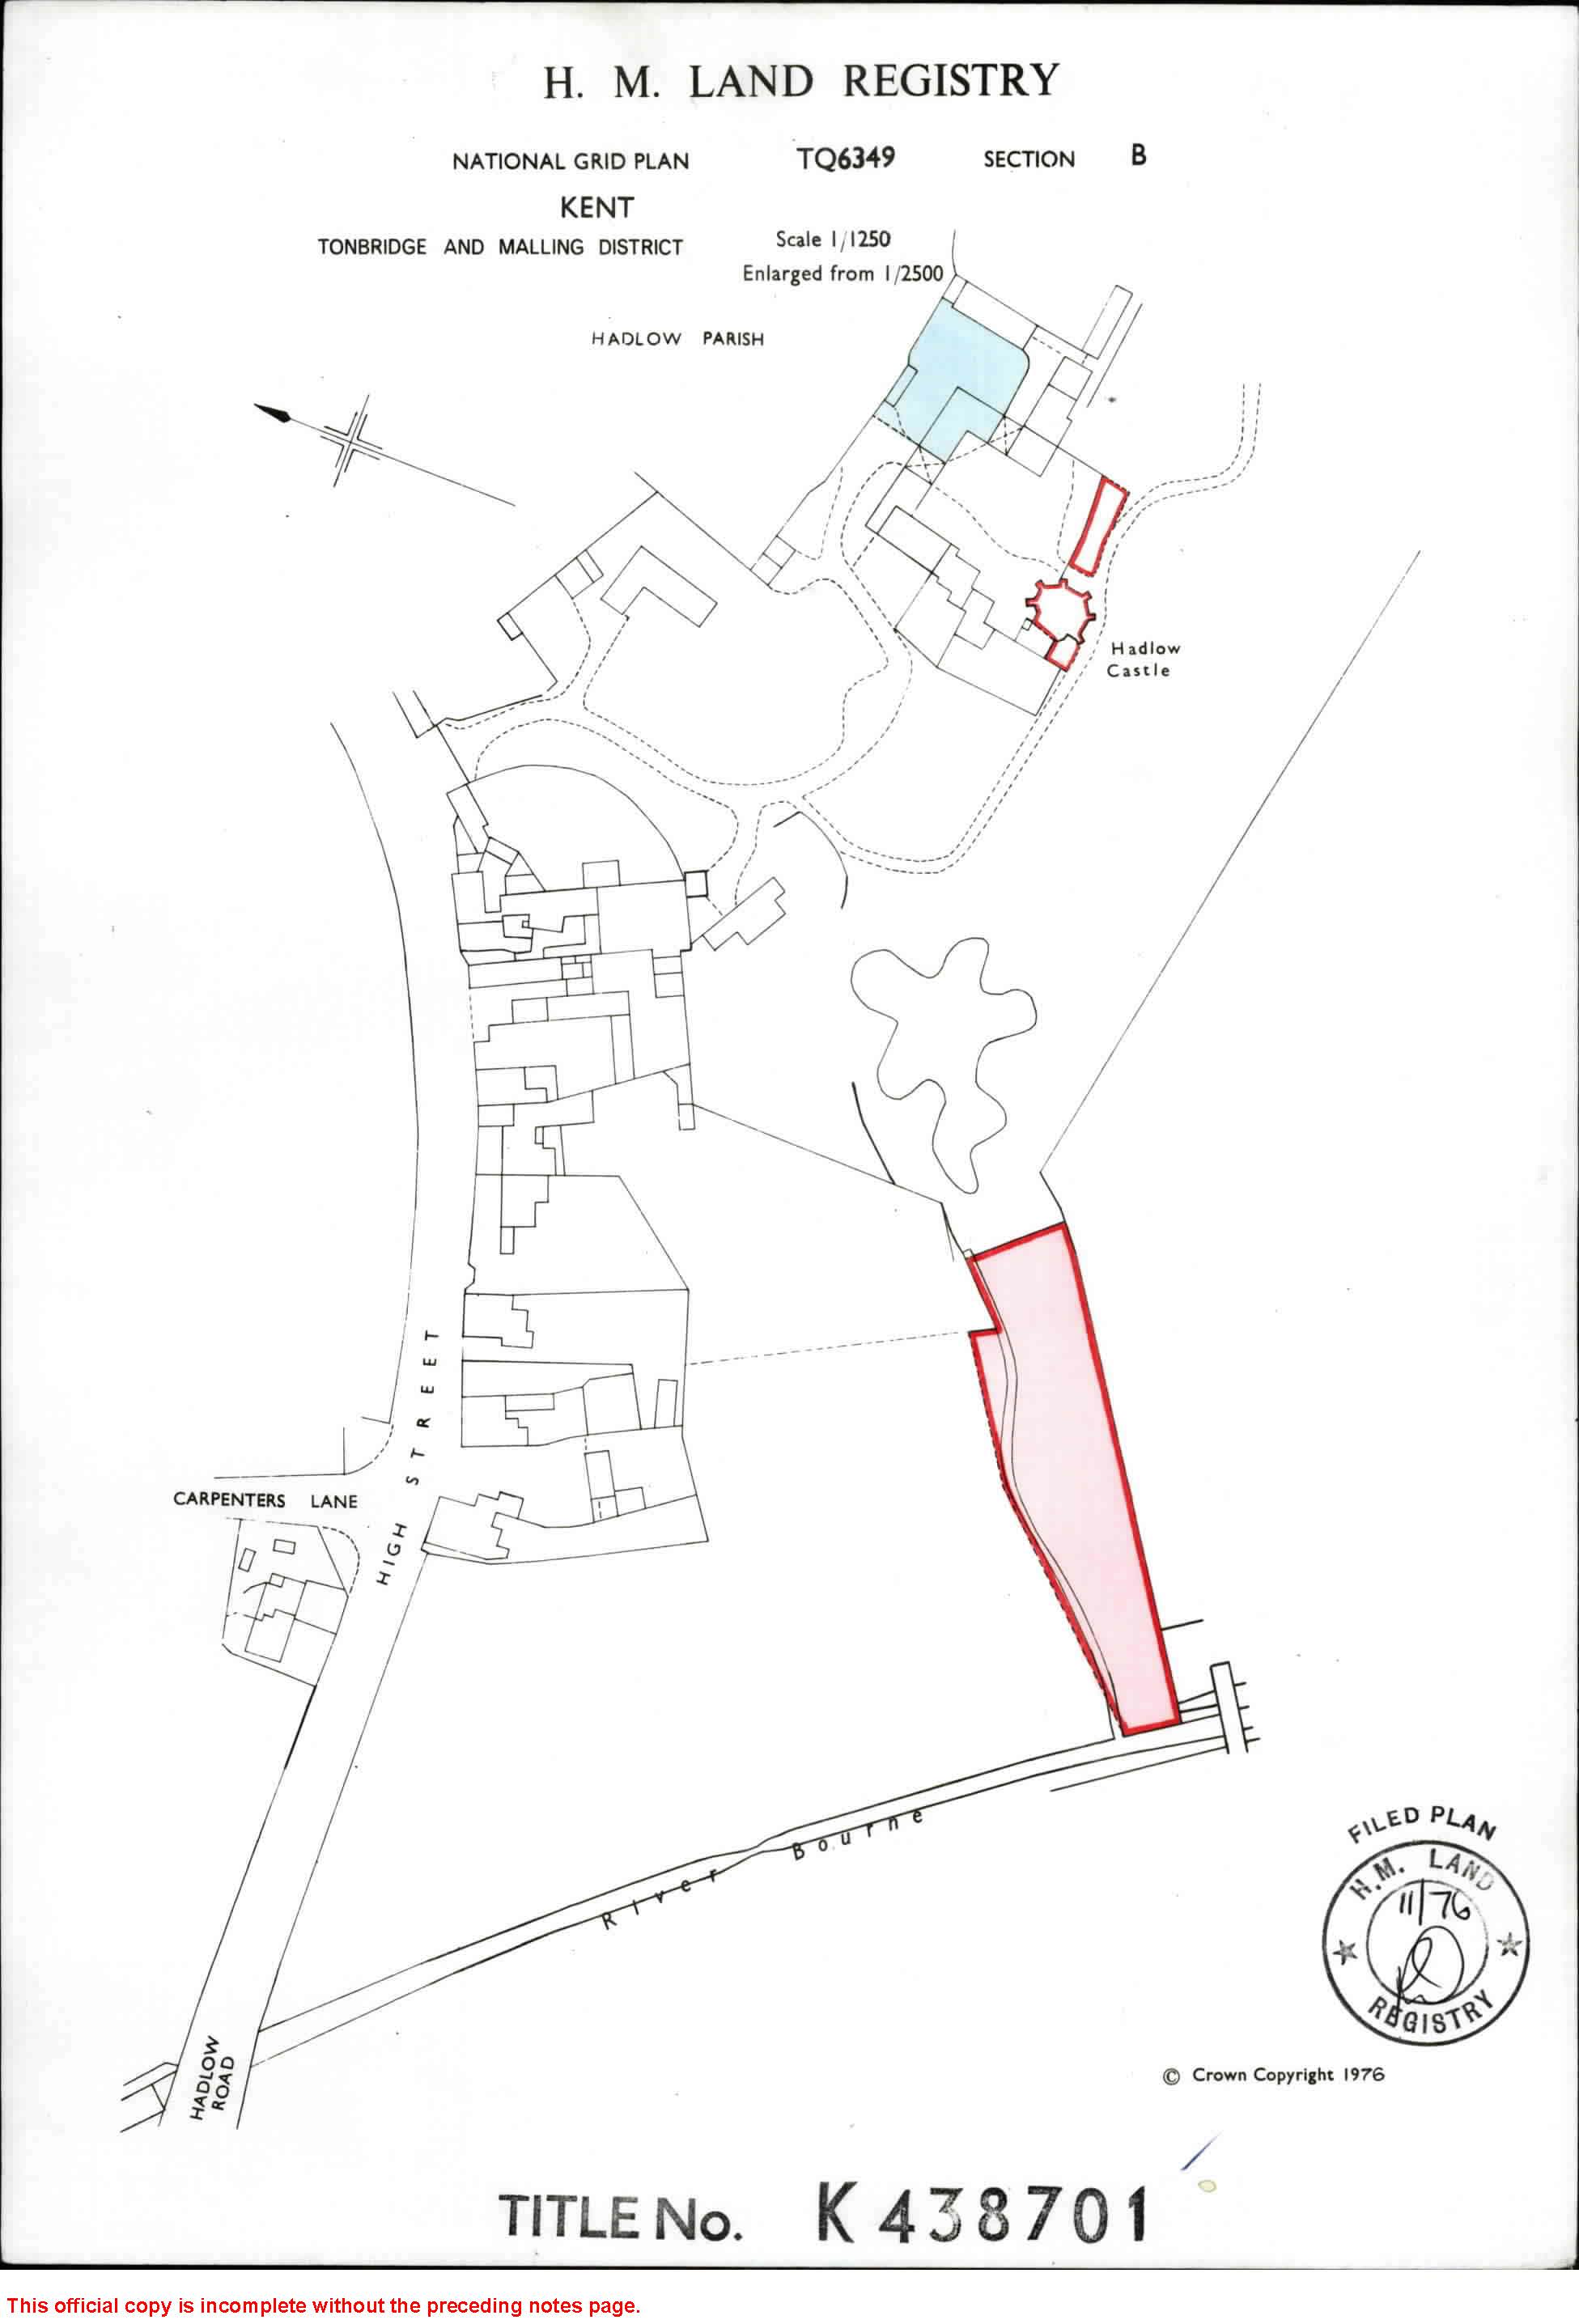 Title Plan -  K438701 - Hadlow Tower_Page_2.jpg